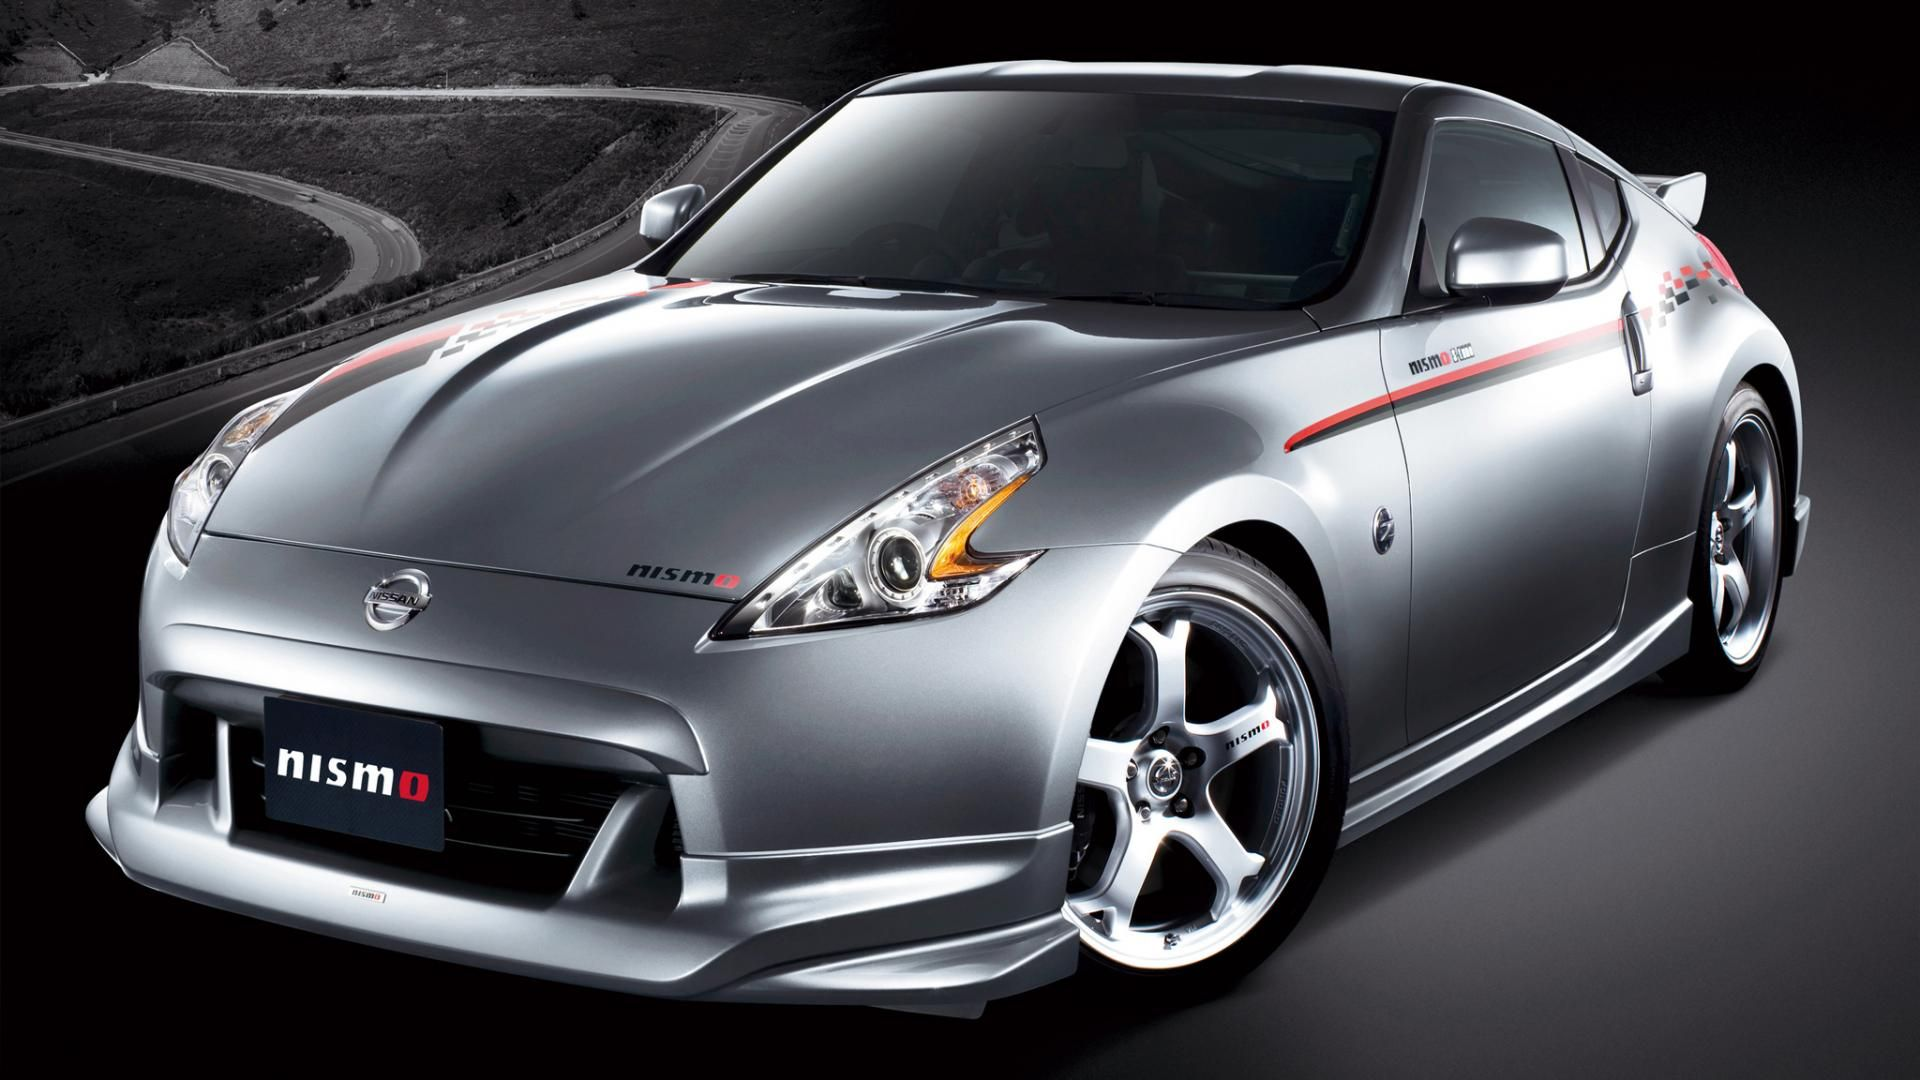 Nissan 350z hd photo 5